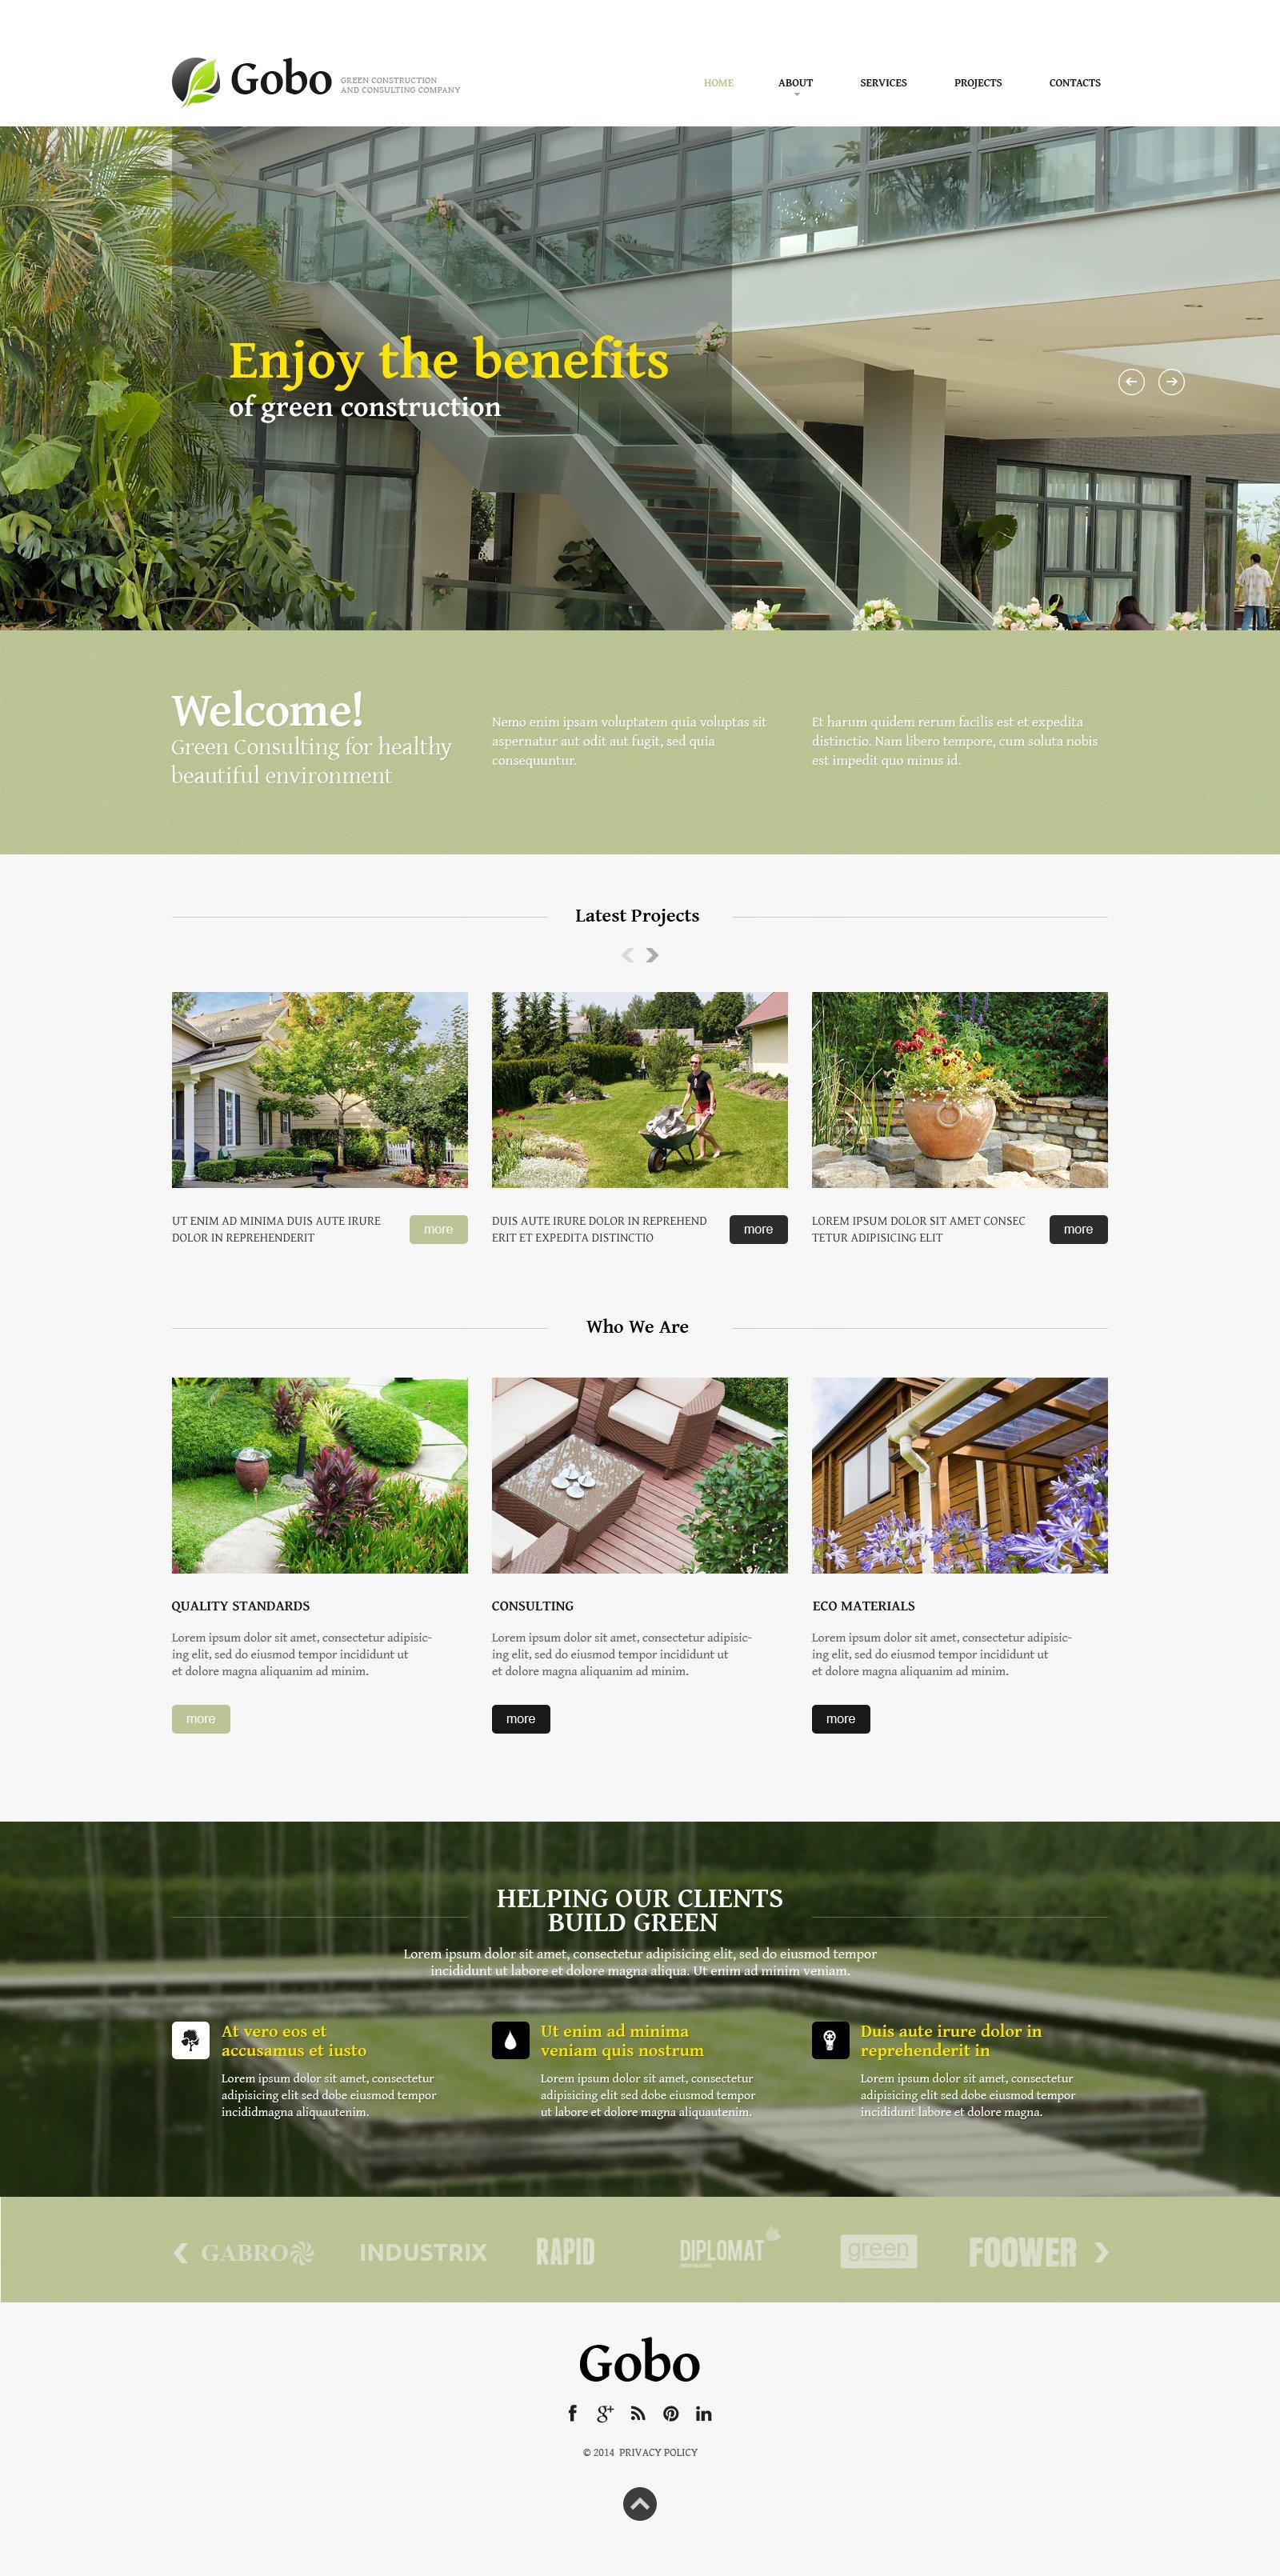 Plantilla Web Responsive para Sitio de Diseño de paisaje #49636